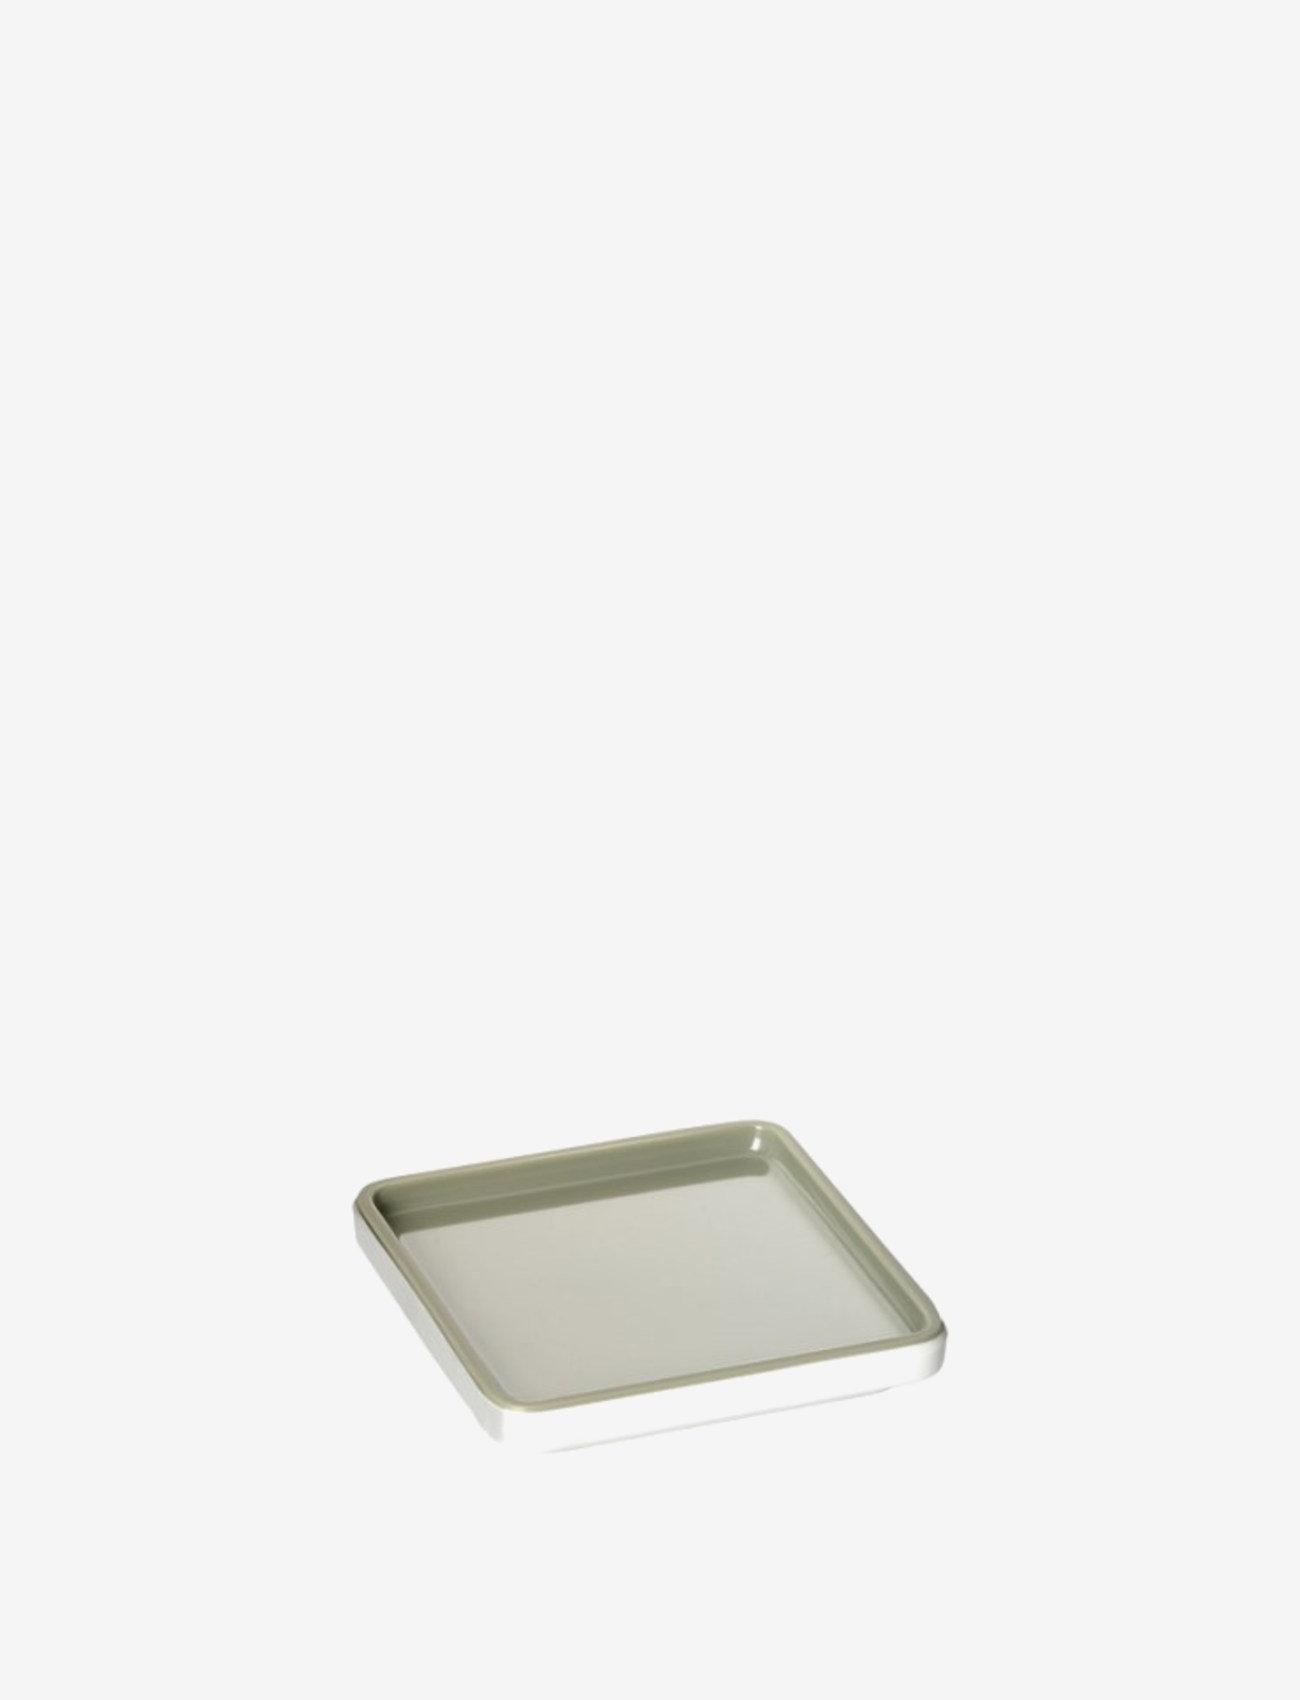 PANTONE - FOOD TRAY S TEA-16-0213 - tarjoiluastiat ja -lautaset - tea-16-0213 - 0